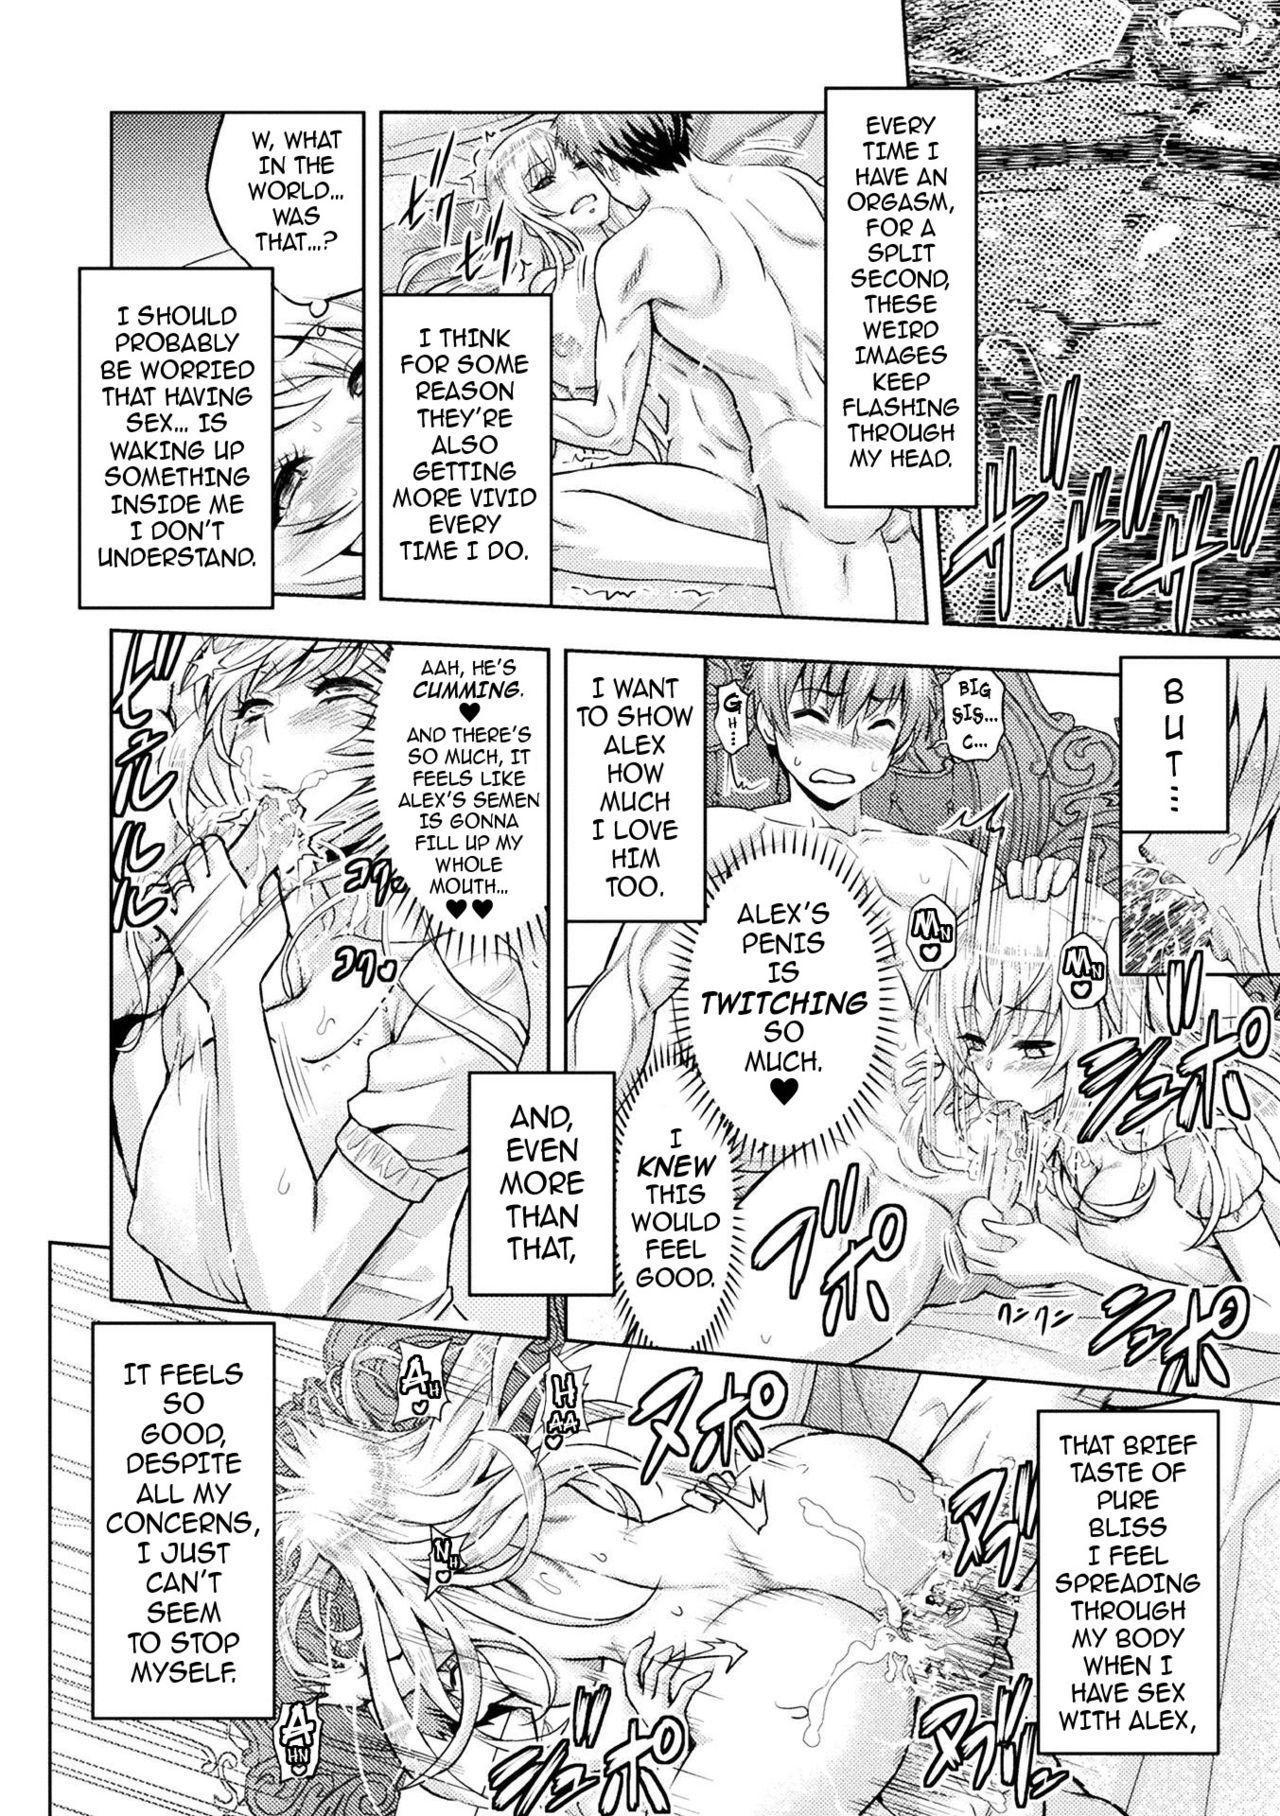 [Yamada Gogogo] Erona ~Orc no Inmon ni Okasareta Onna Kishi no Matsuro~ | Erona ~The Fall of a Beautiful Knight Cursed with the Lewd Mark of an Orc~ Ch. 1-6 [English] [darknight] [Decensored] [ongoing] 141